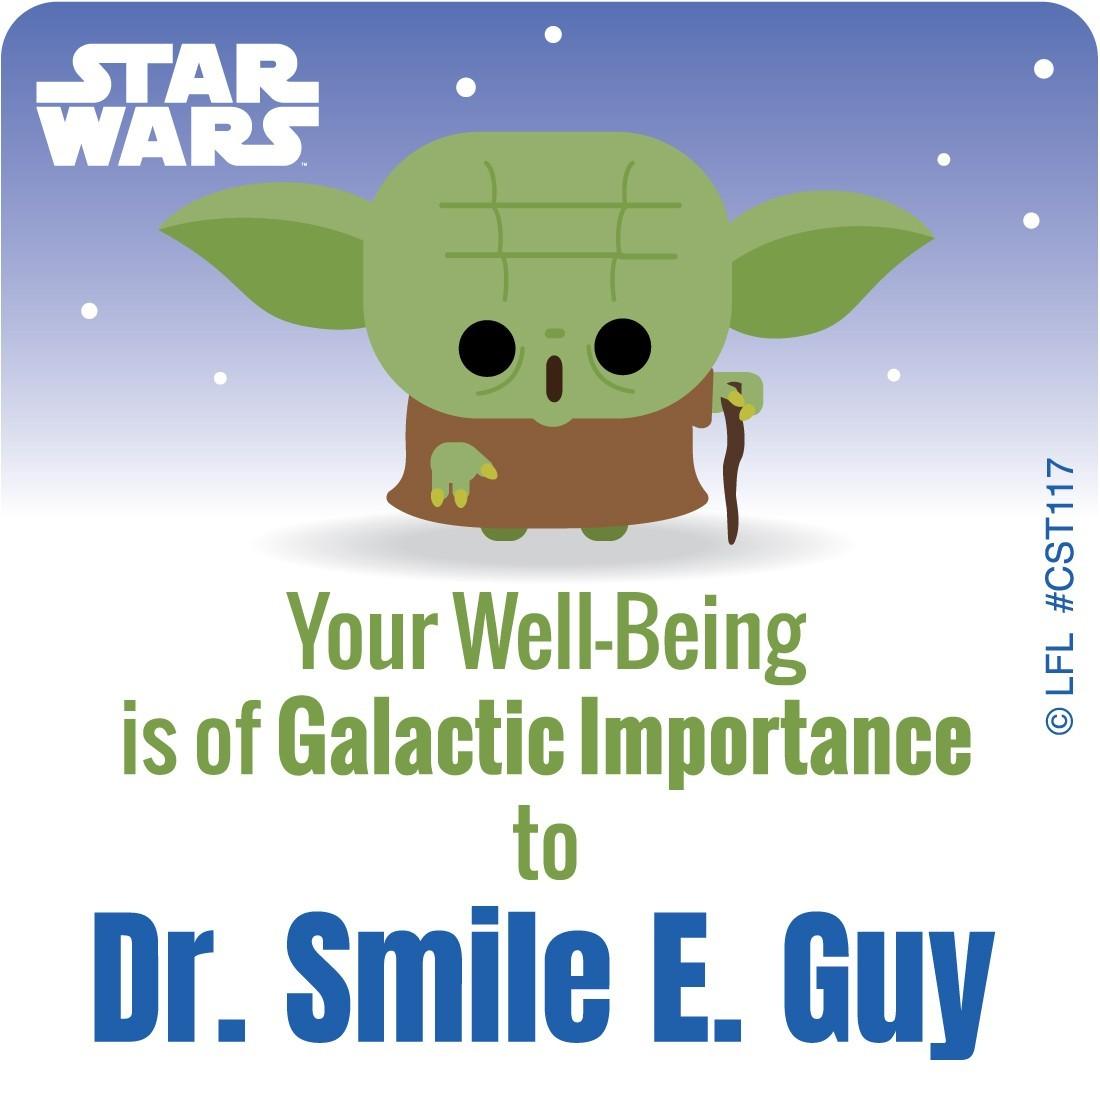 Star Wars Custom Stickers   [image]